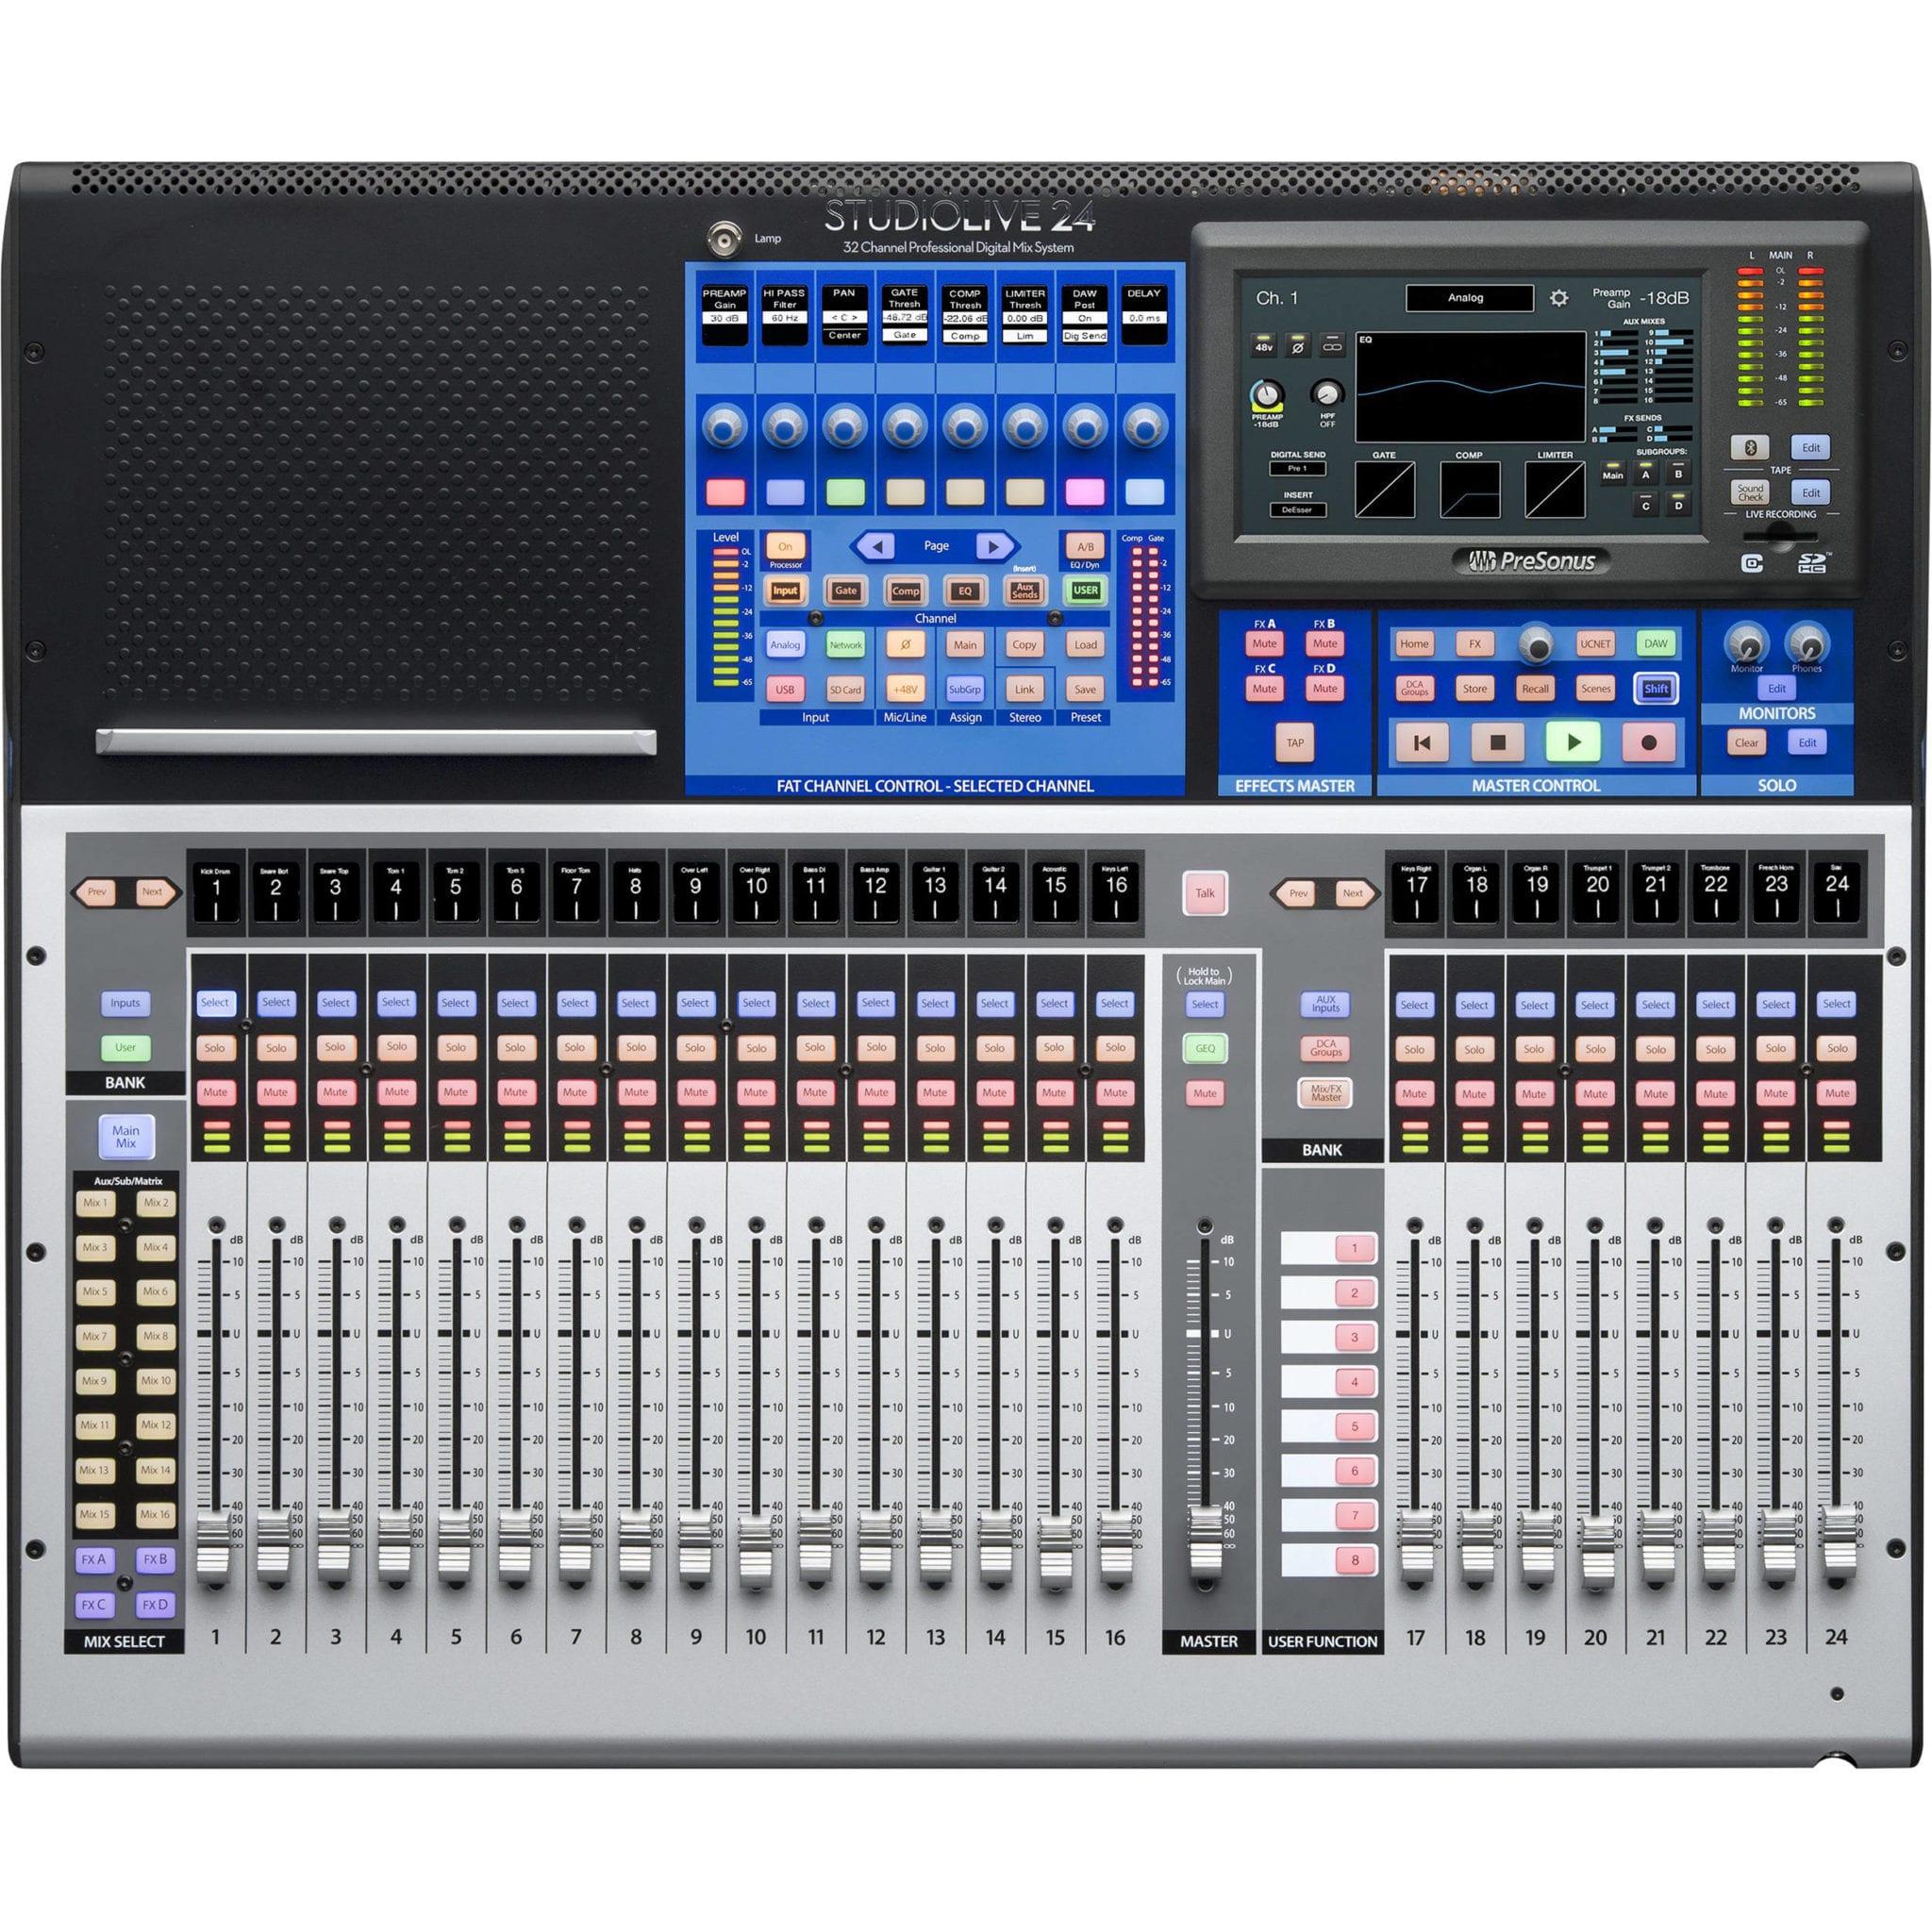 presonus studiolive 24 series iii digital mixer 32 input with 25 motorized faders cables. Black Bedroom Furniture Sets. Home Design Ideas